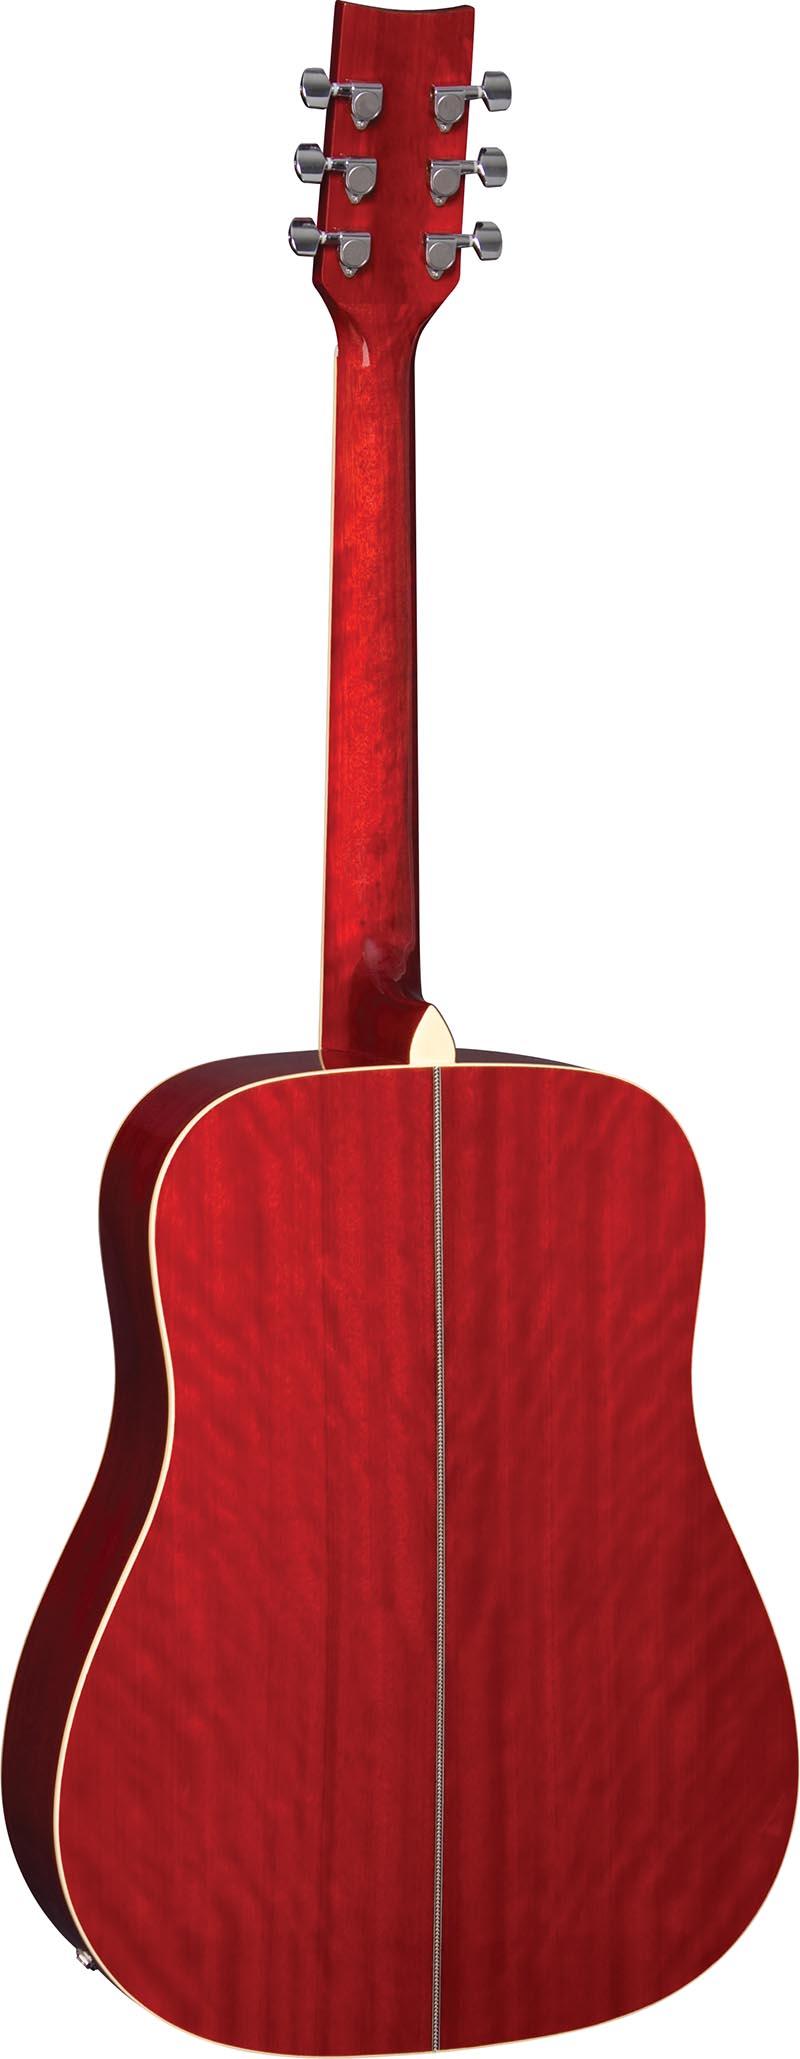 ch887 violao folk dreadnought eagle ch887 rds vermelho sunburst visao posterior vertical